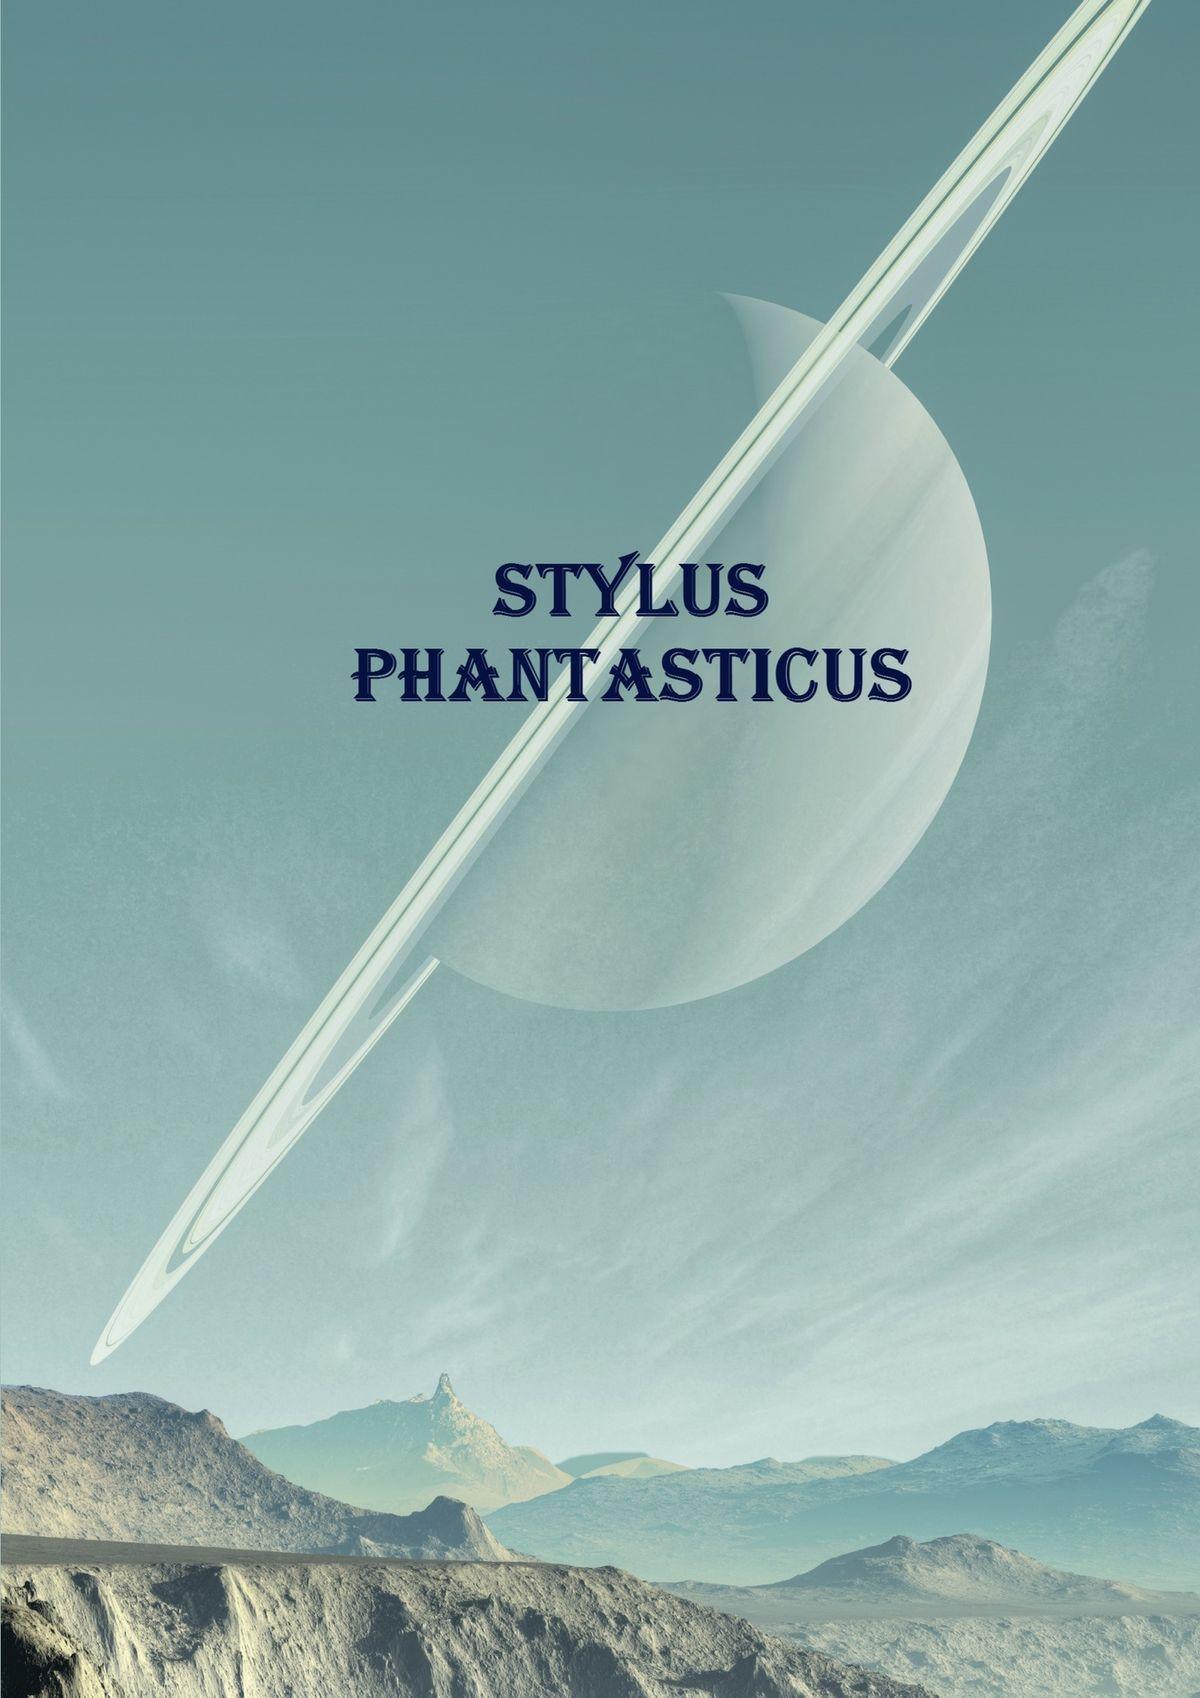 Алексей Ведёхин Stylus Phantasticus. Антология-2017 алексей ведёхин сказка модерн болотный киберпанк